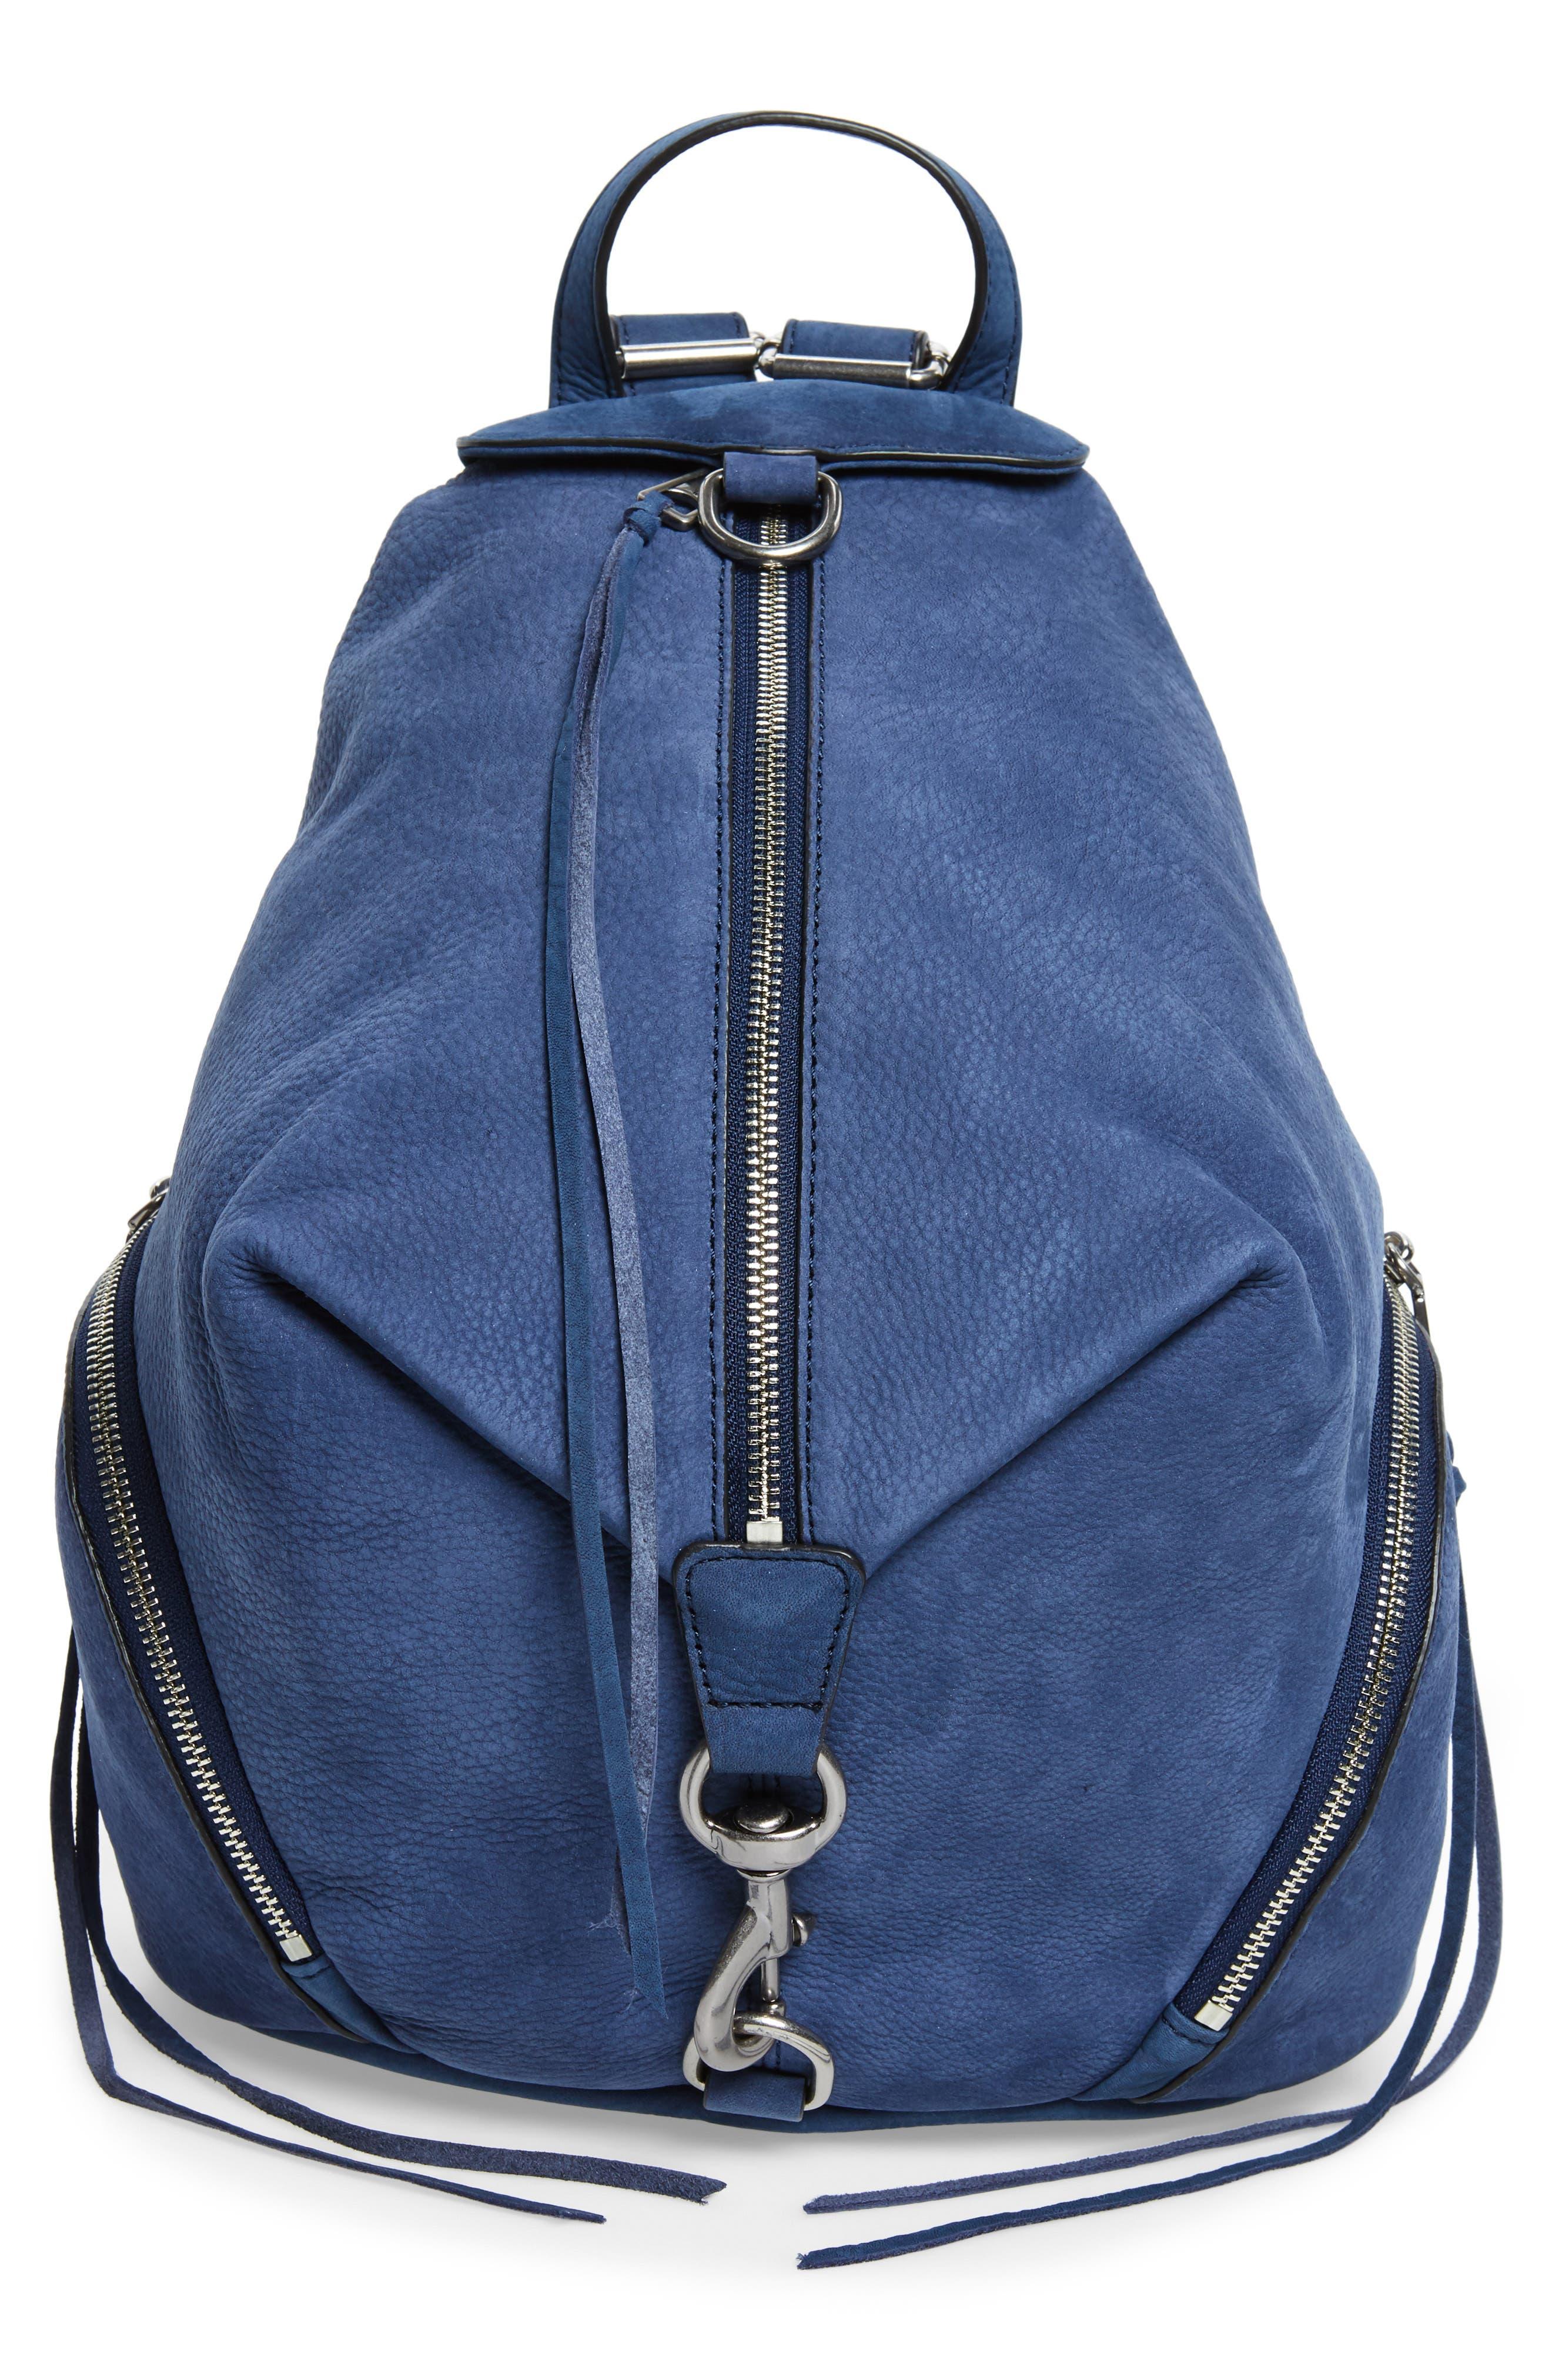 Julian Convertible Nubuck Leather Backpack,                         Main,                         color, True Navy